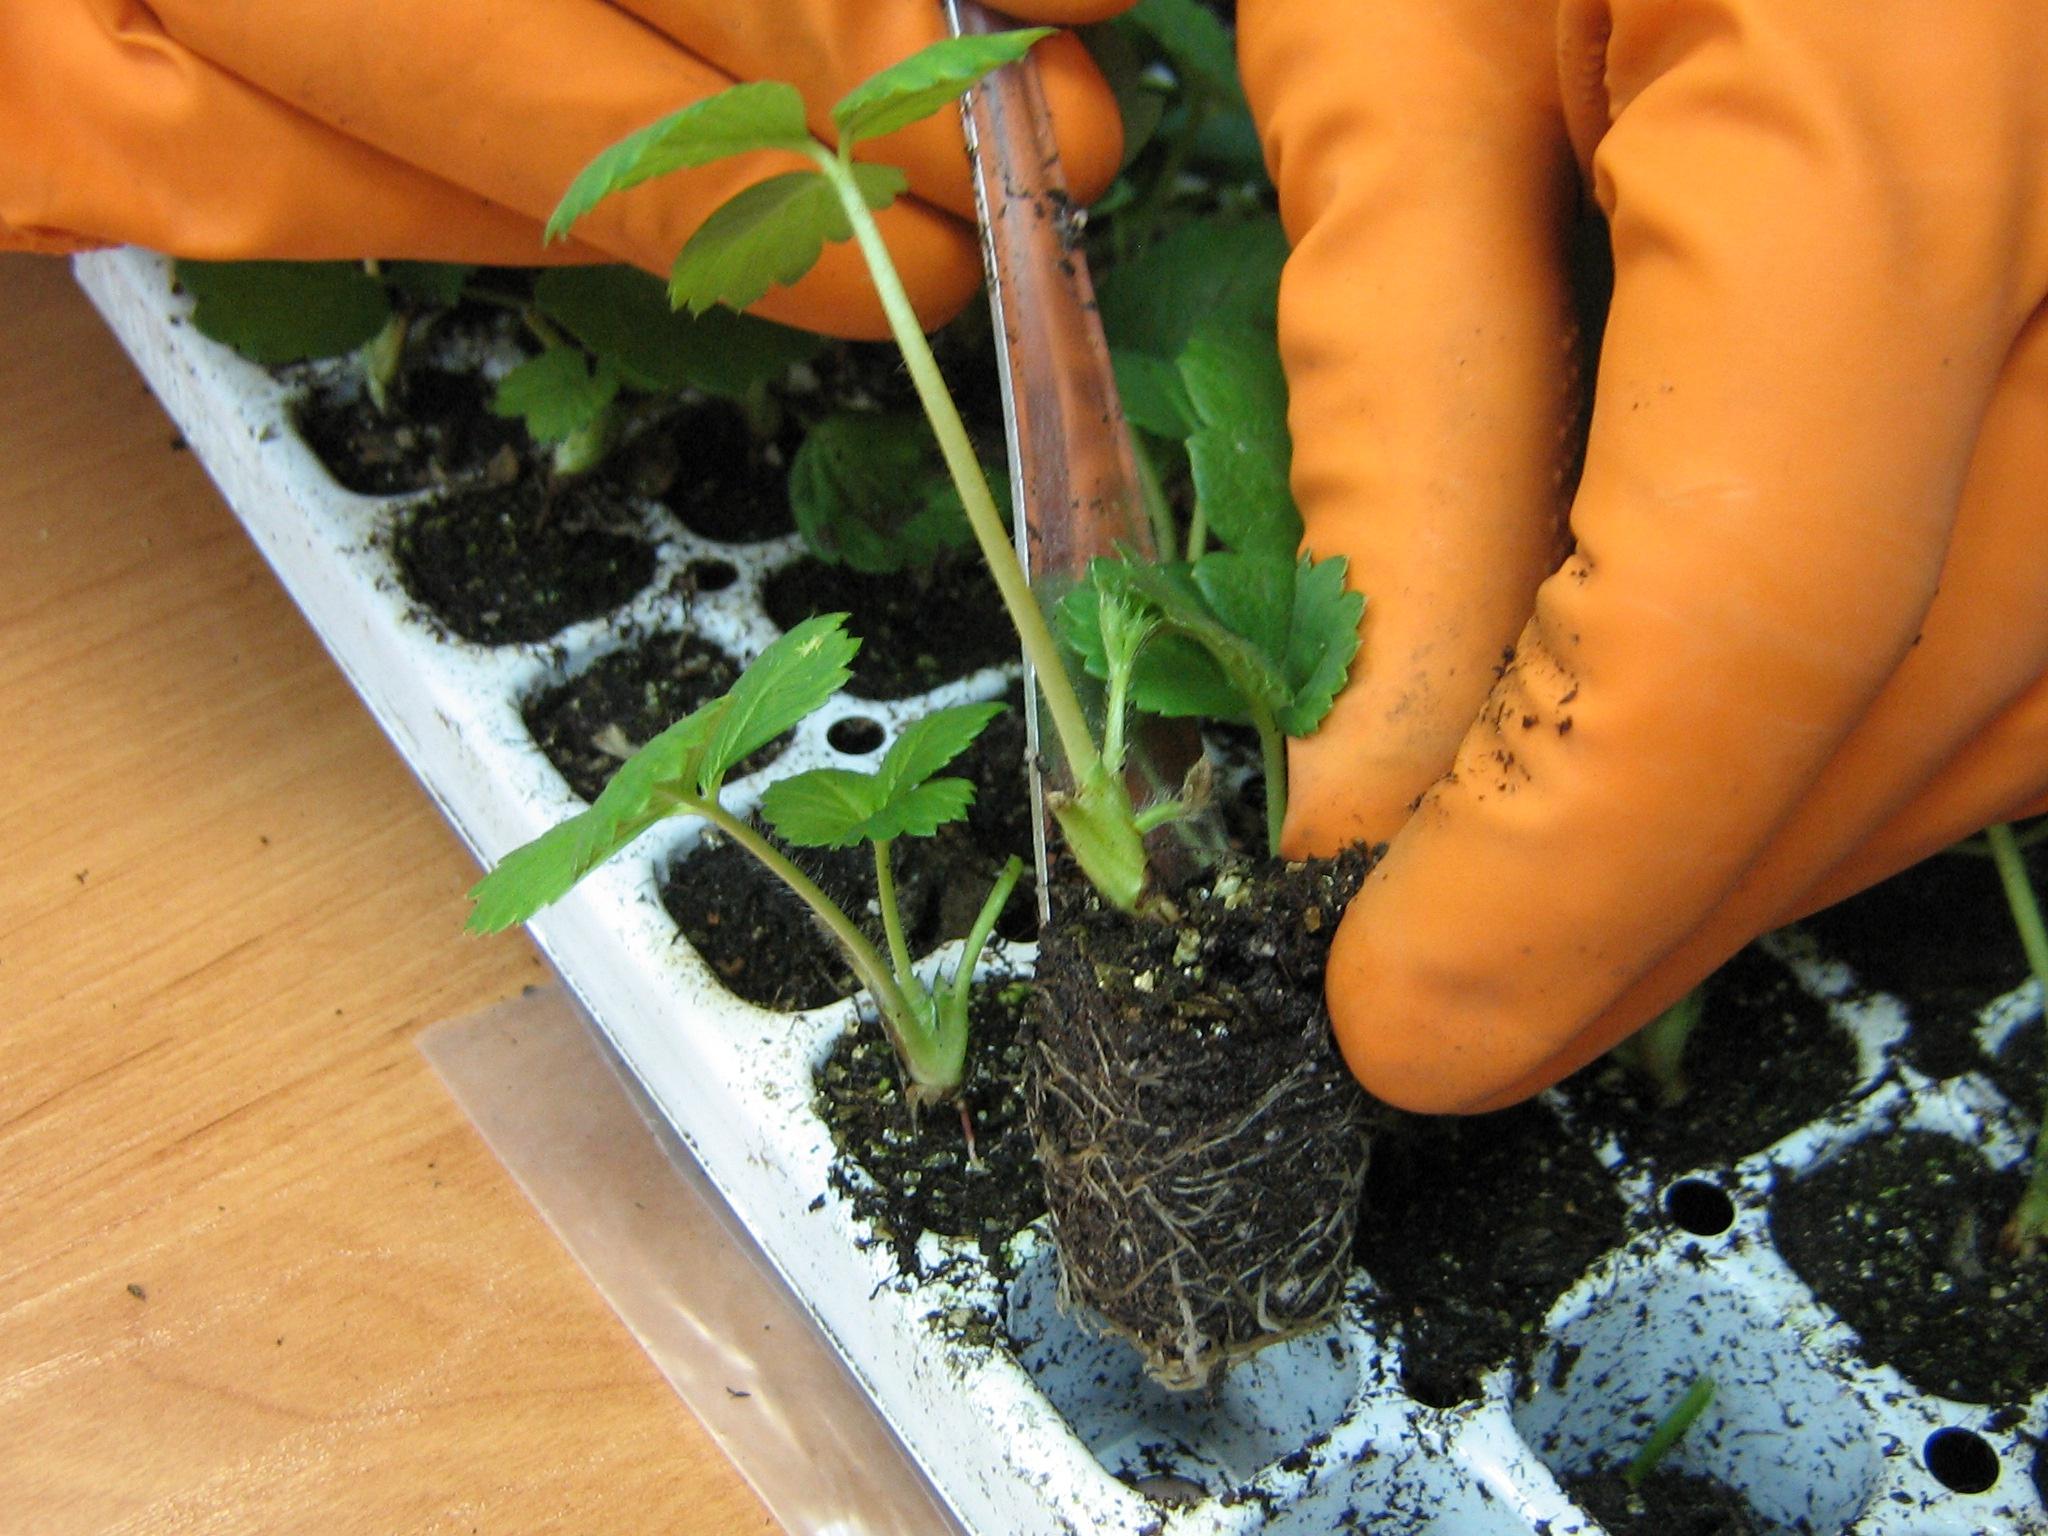 Сад: Выращивание клубники из семян